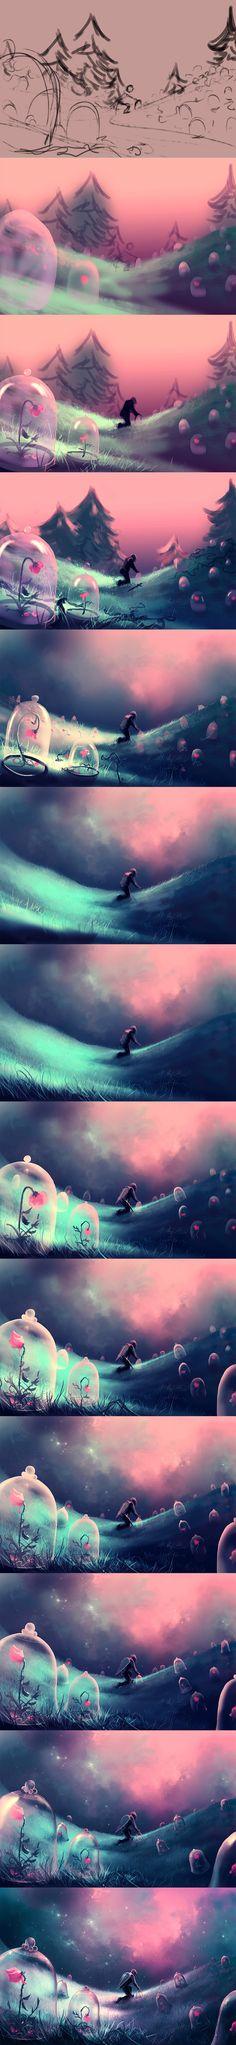 WiP Of You belong to me by AquaSixio.deviantart.com on @deviantART